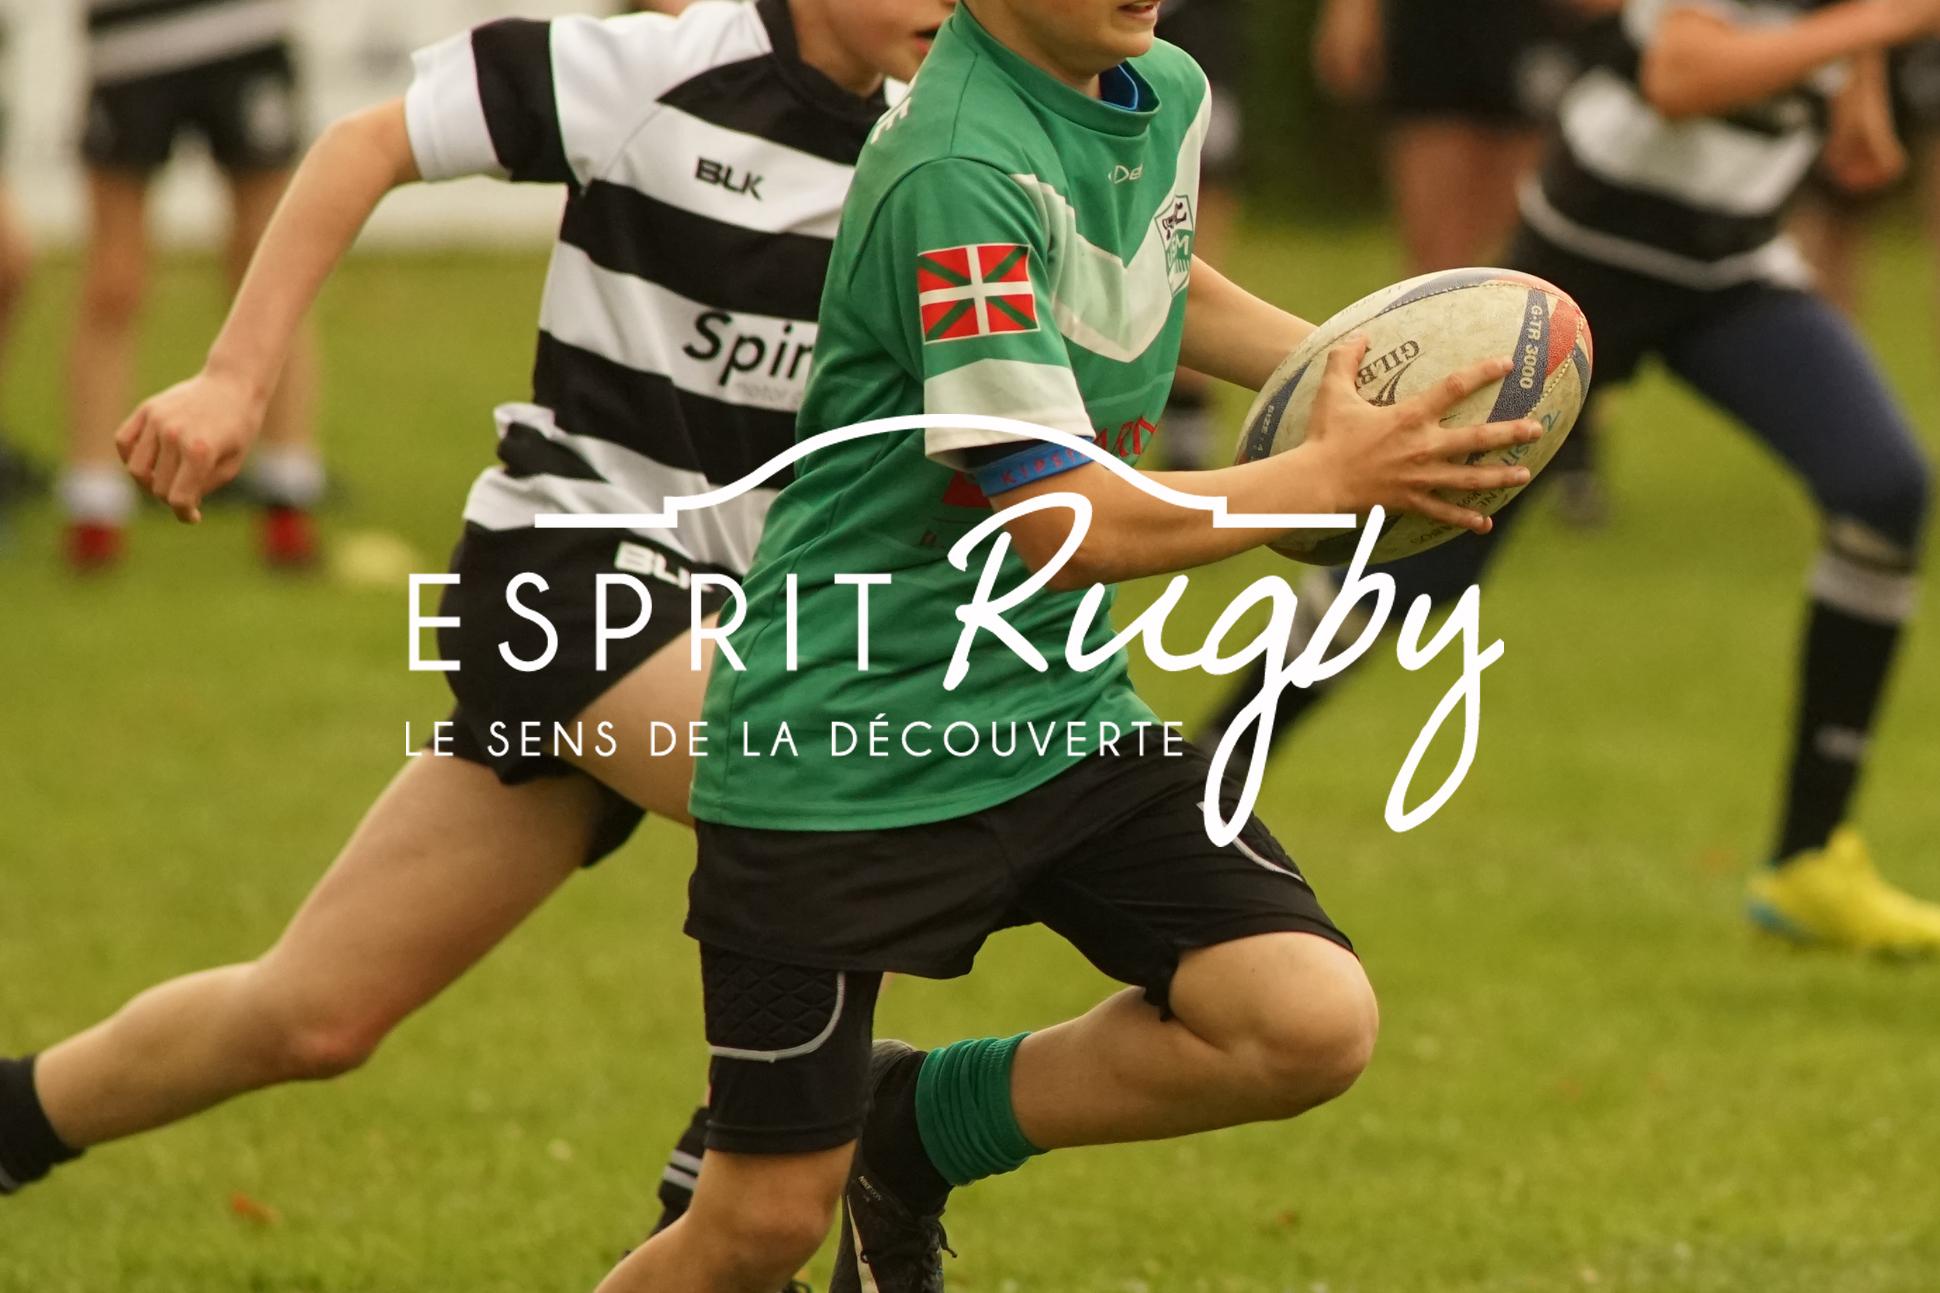 Esprit Rugby Esprit Basque